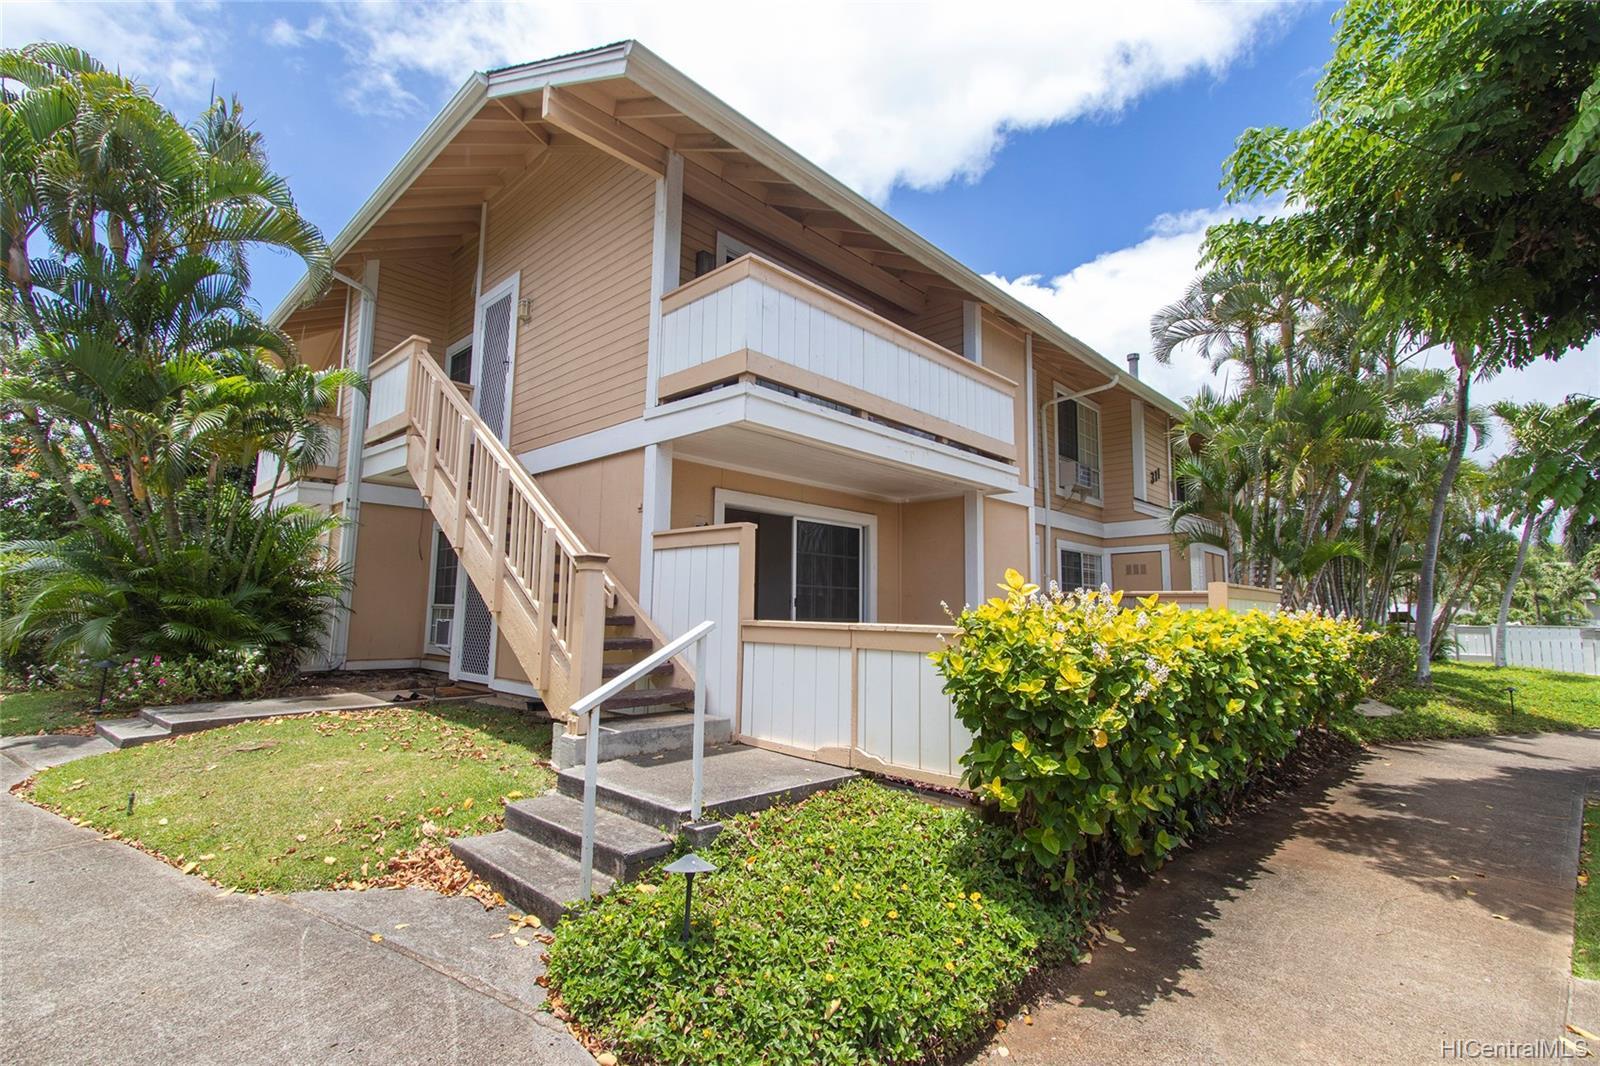 311 Mananai Place townhouse # 45A, Honolulu, Hawaii - photo 1 of 25